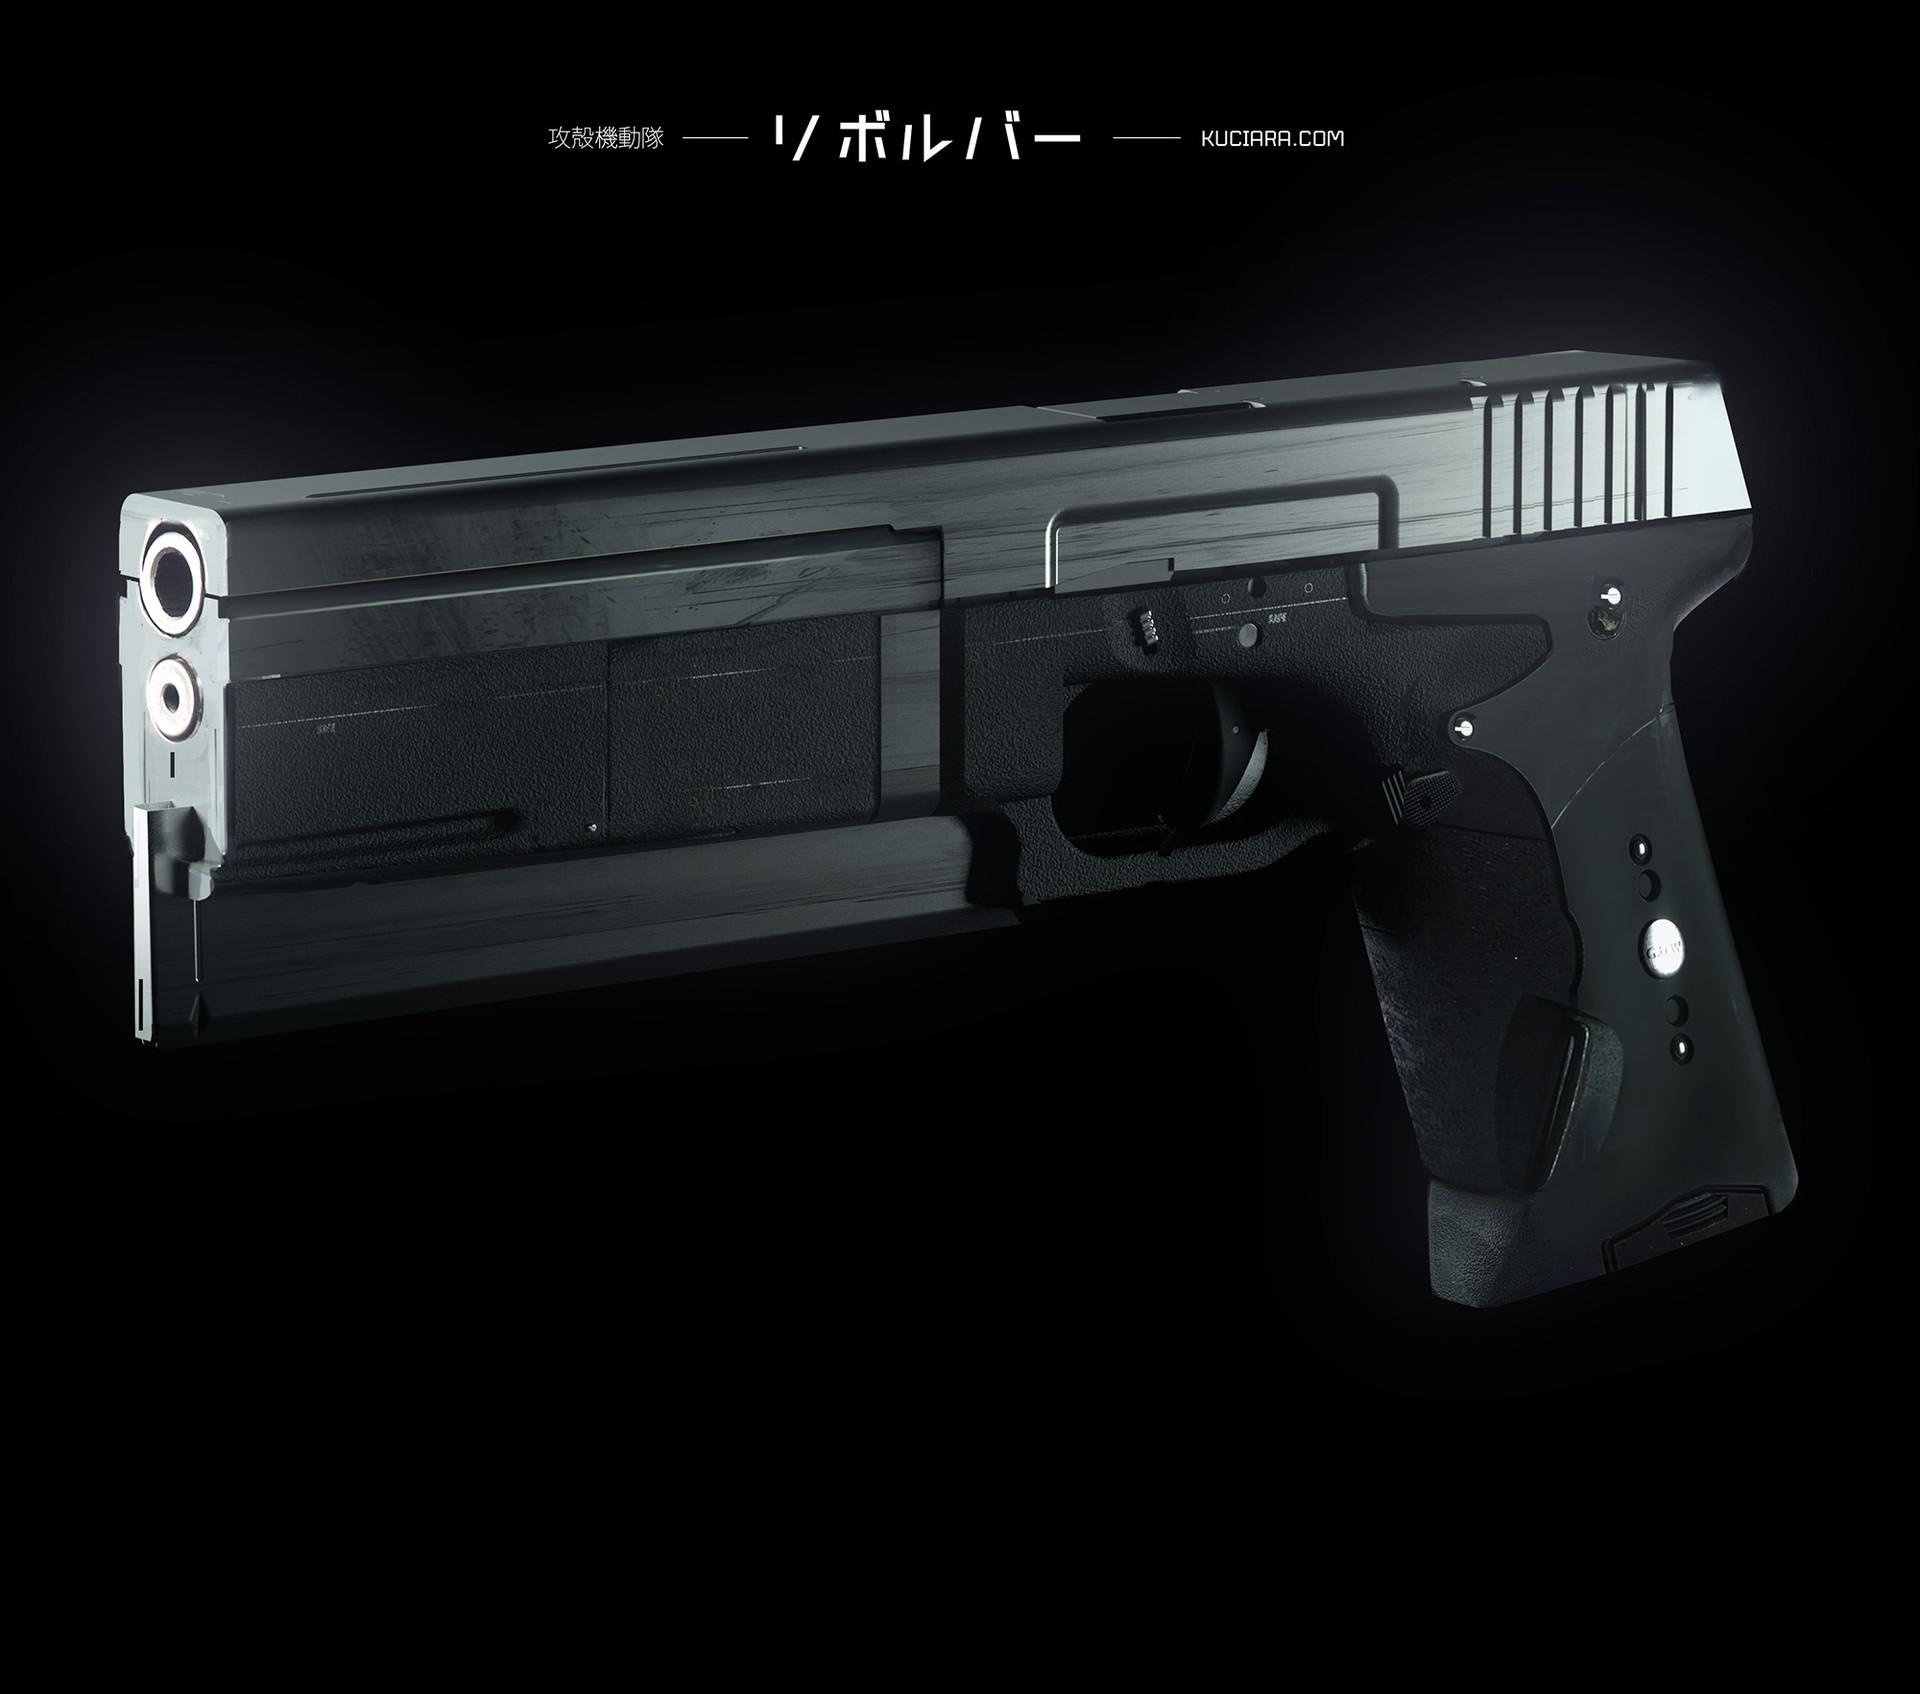 Maciej kuciara 092915 wpn batou pistol mk v001